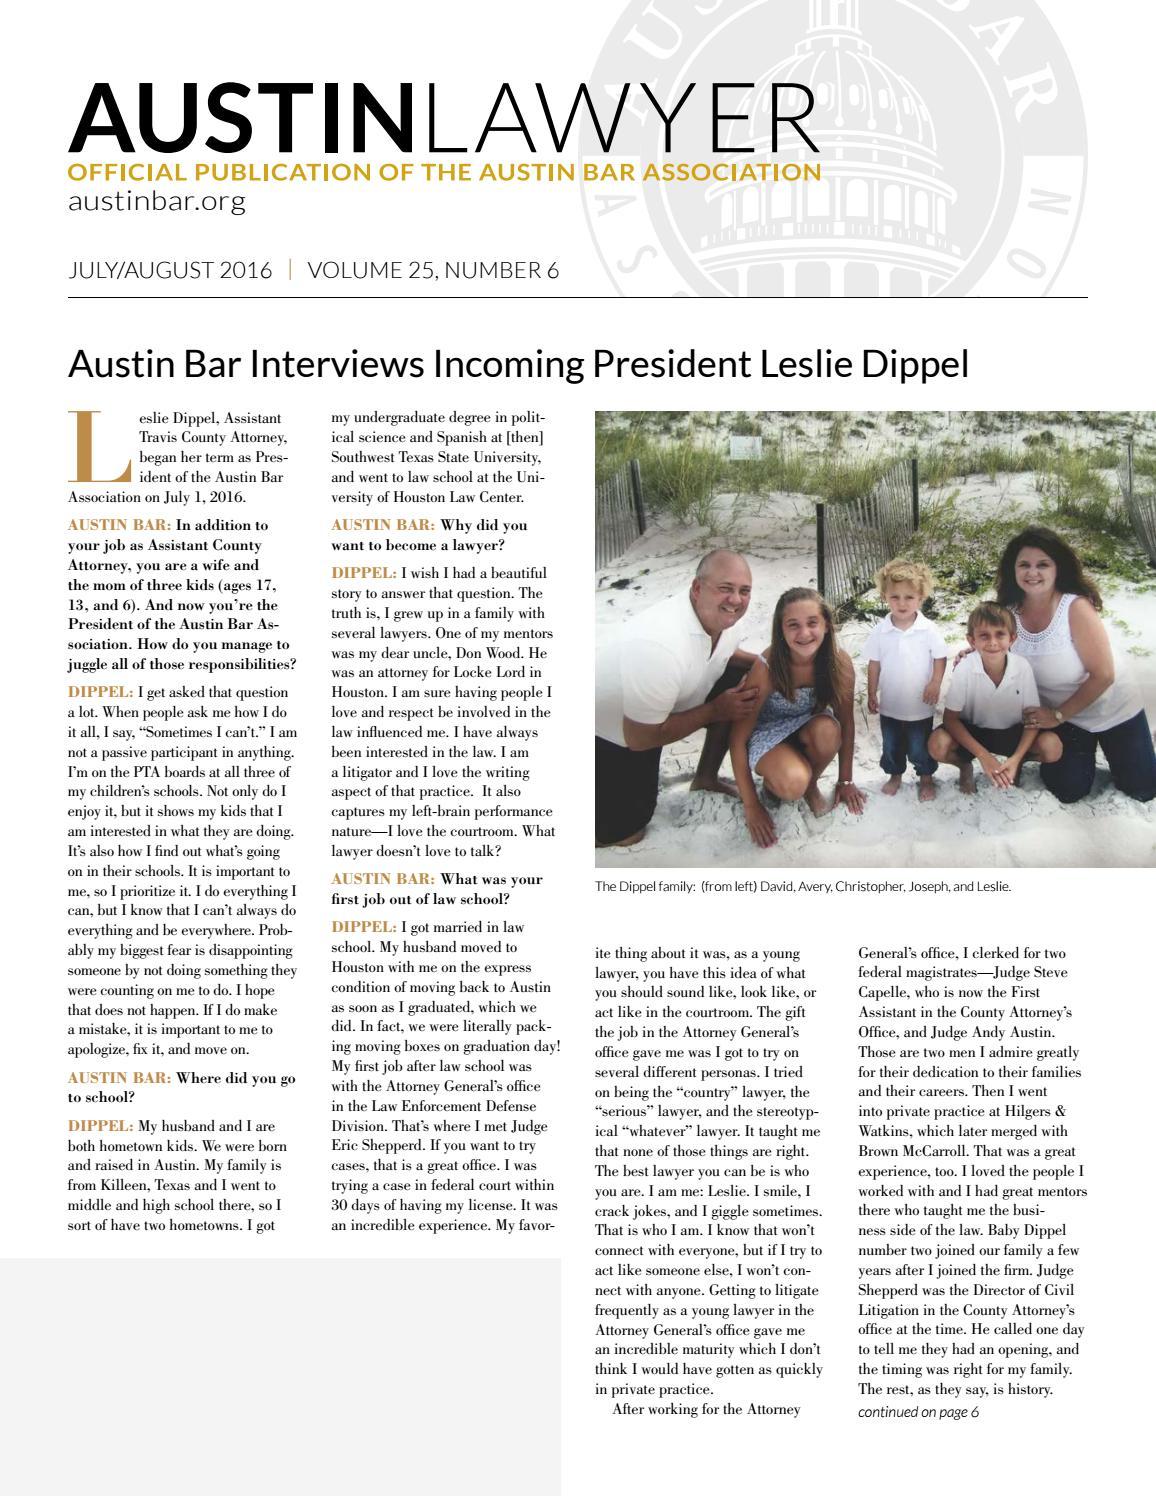 Austin Lawyer, July/August 2016 by Austin Bar Association